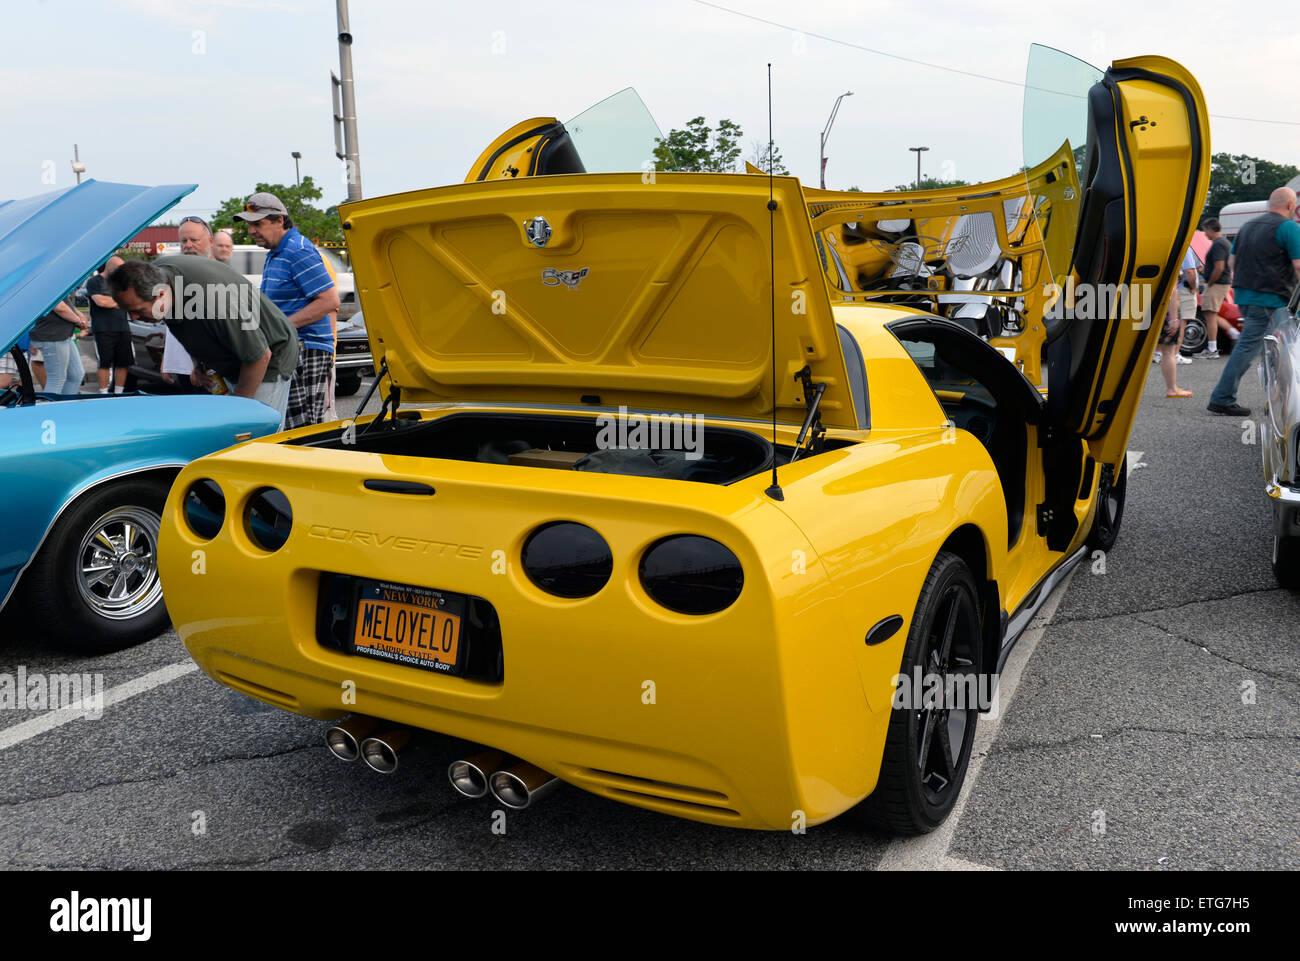 New York USA. 12th June 2015. A modified yellow 2003 Corvette 50th Anniversary & Lambo Door Stock Photos \u0026 Lambo Door Stock Images - Alamy